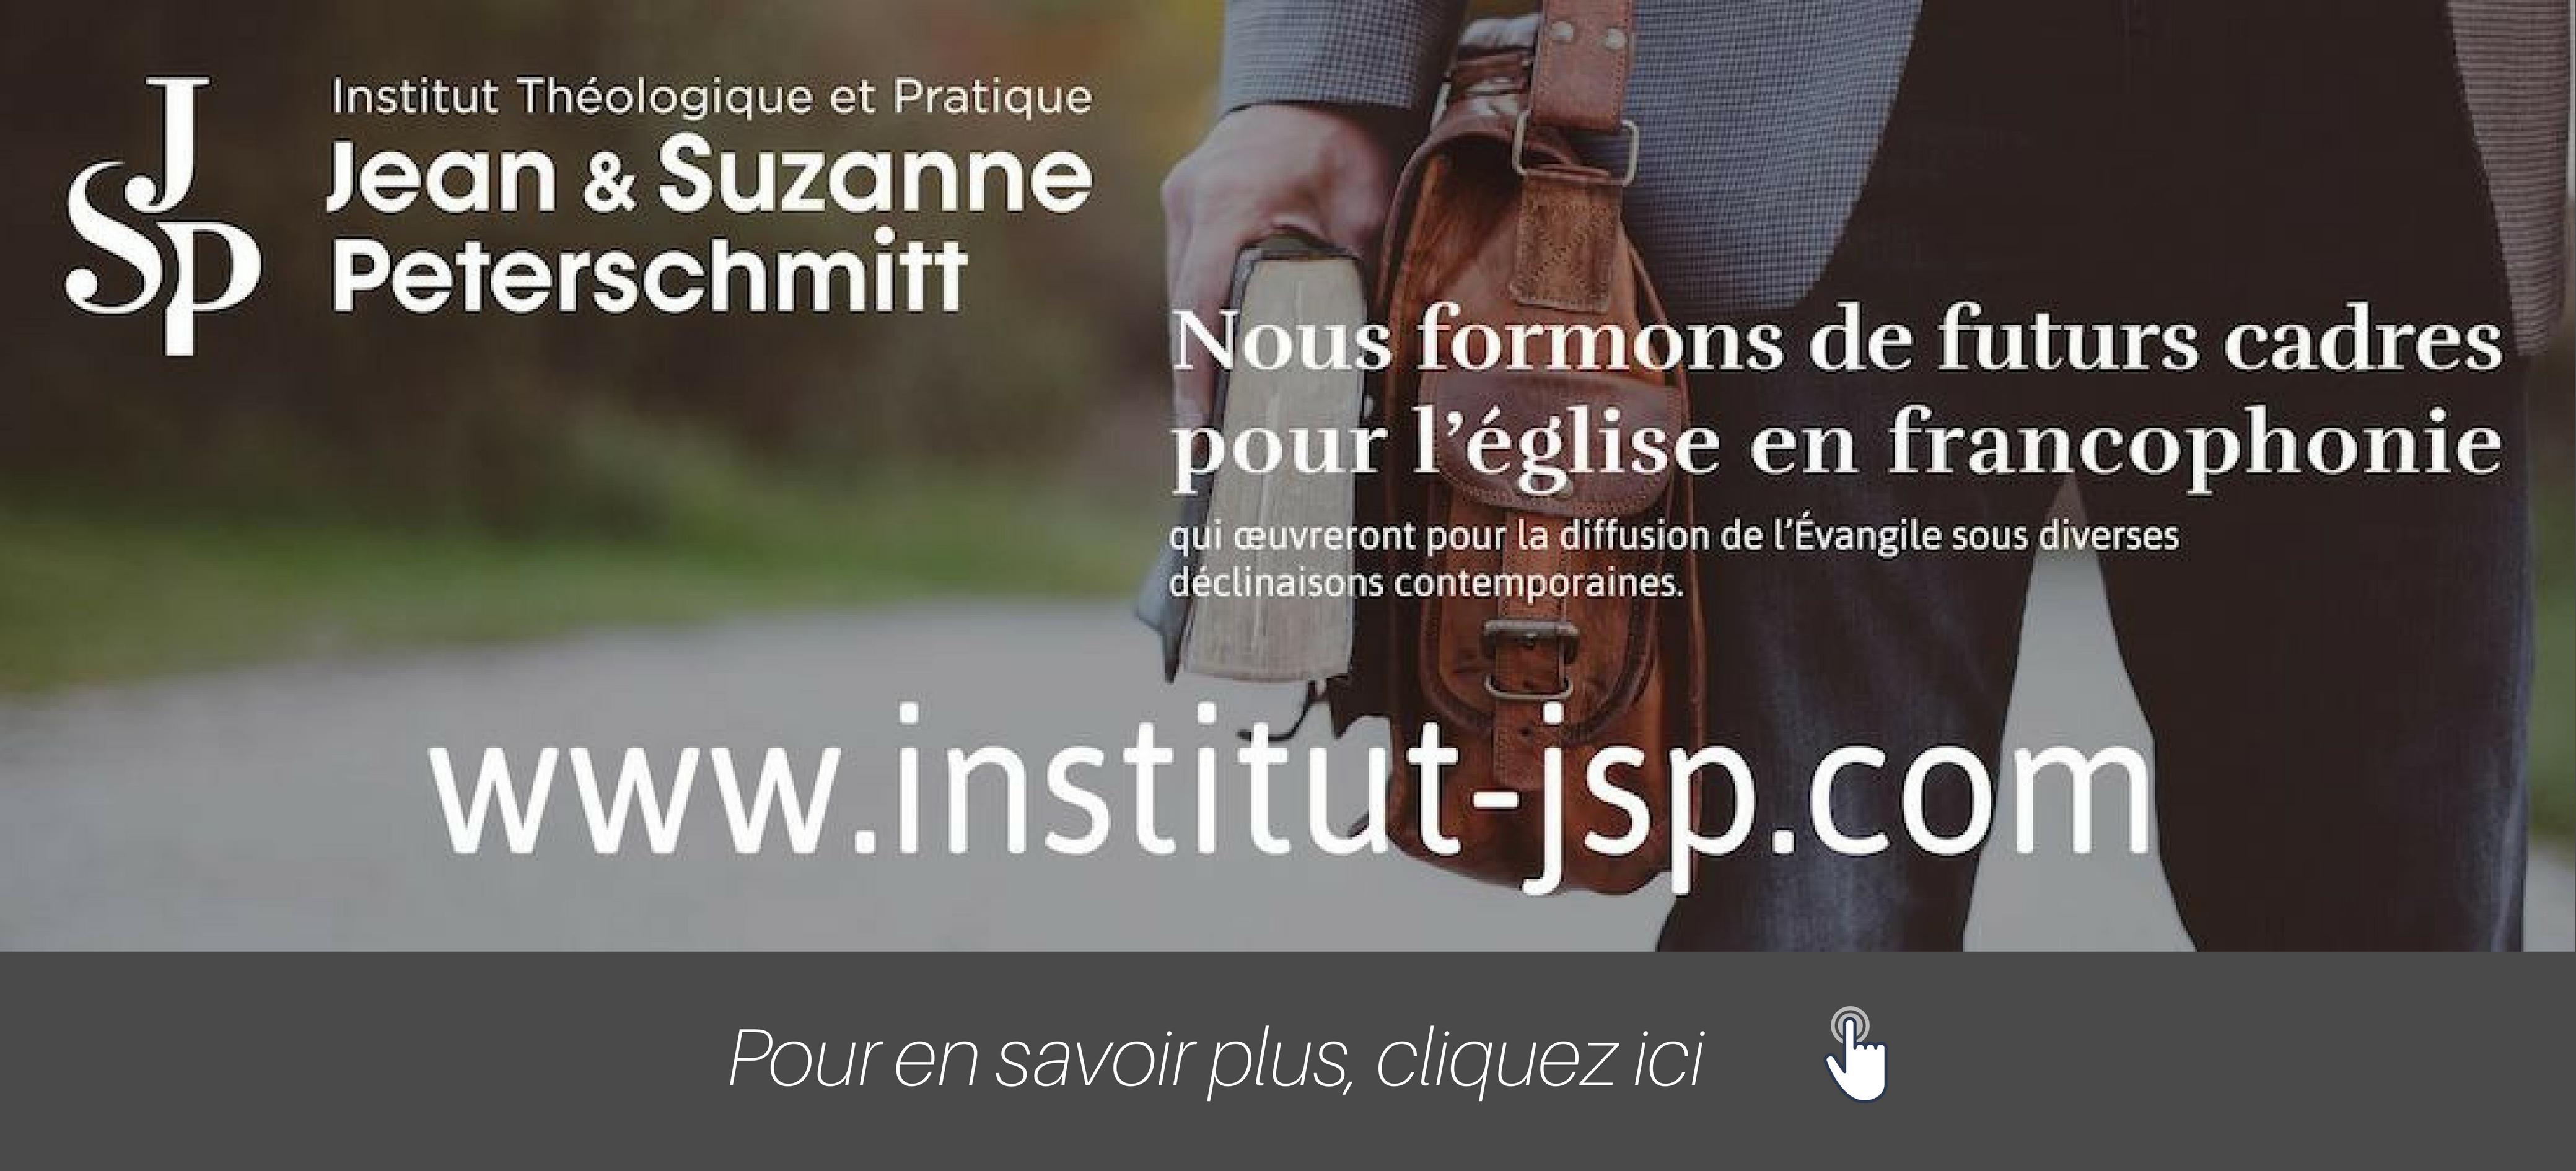 Institut Théologique et Pratique JSP